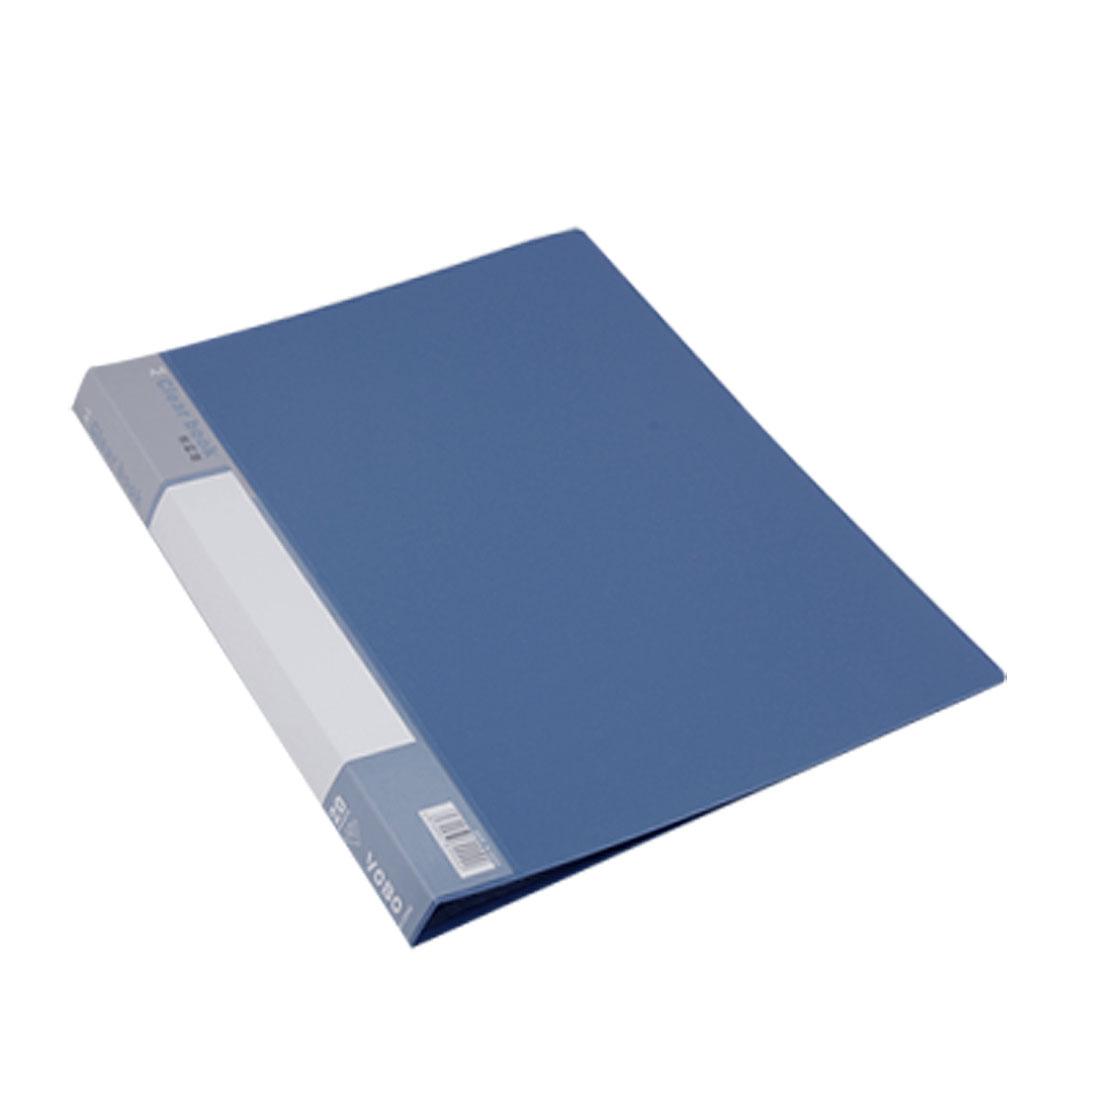 Clear Plastic Book Cover Protectors